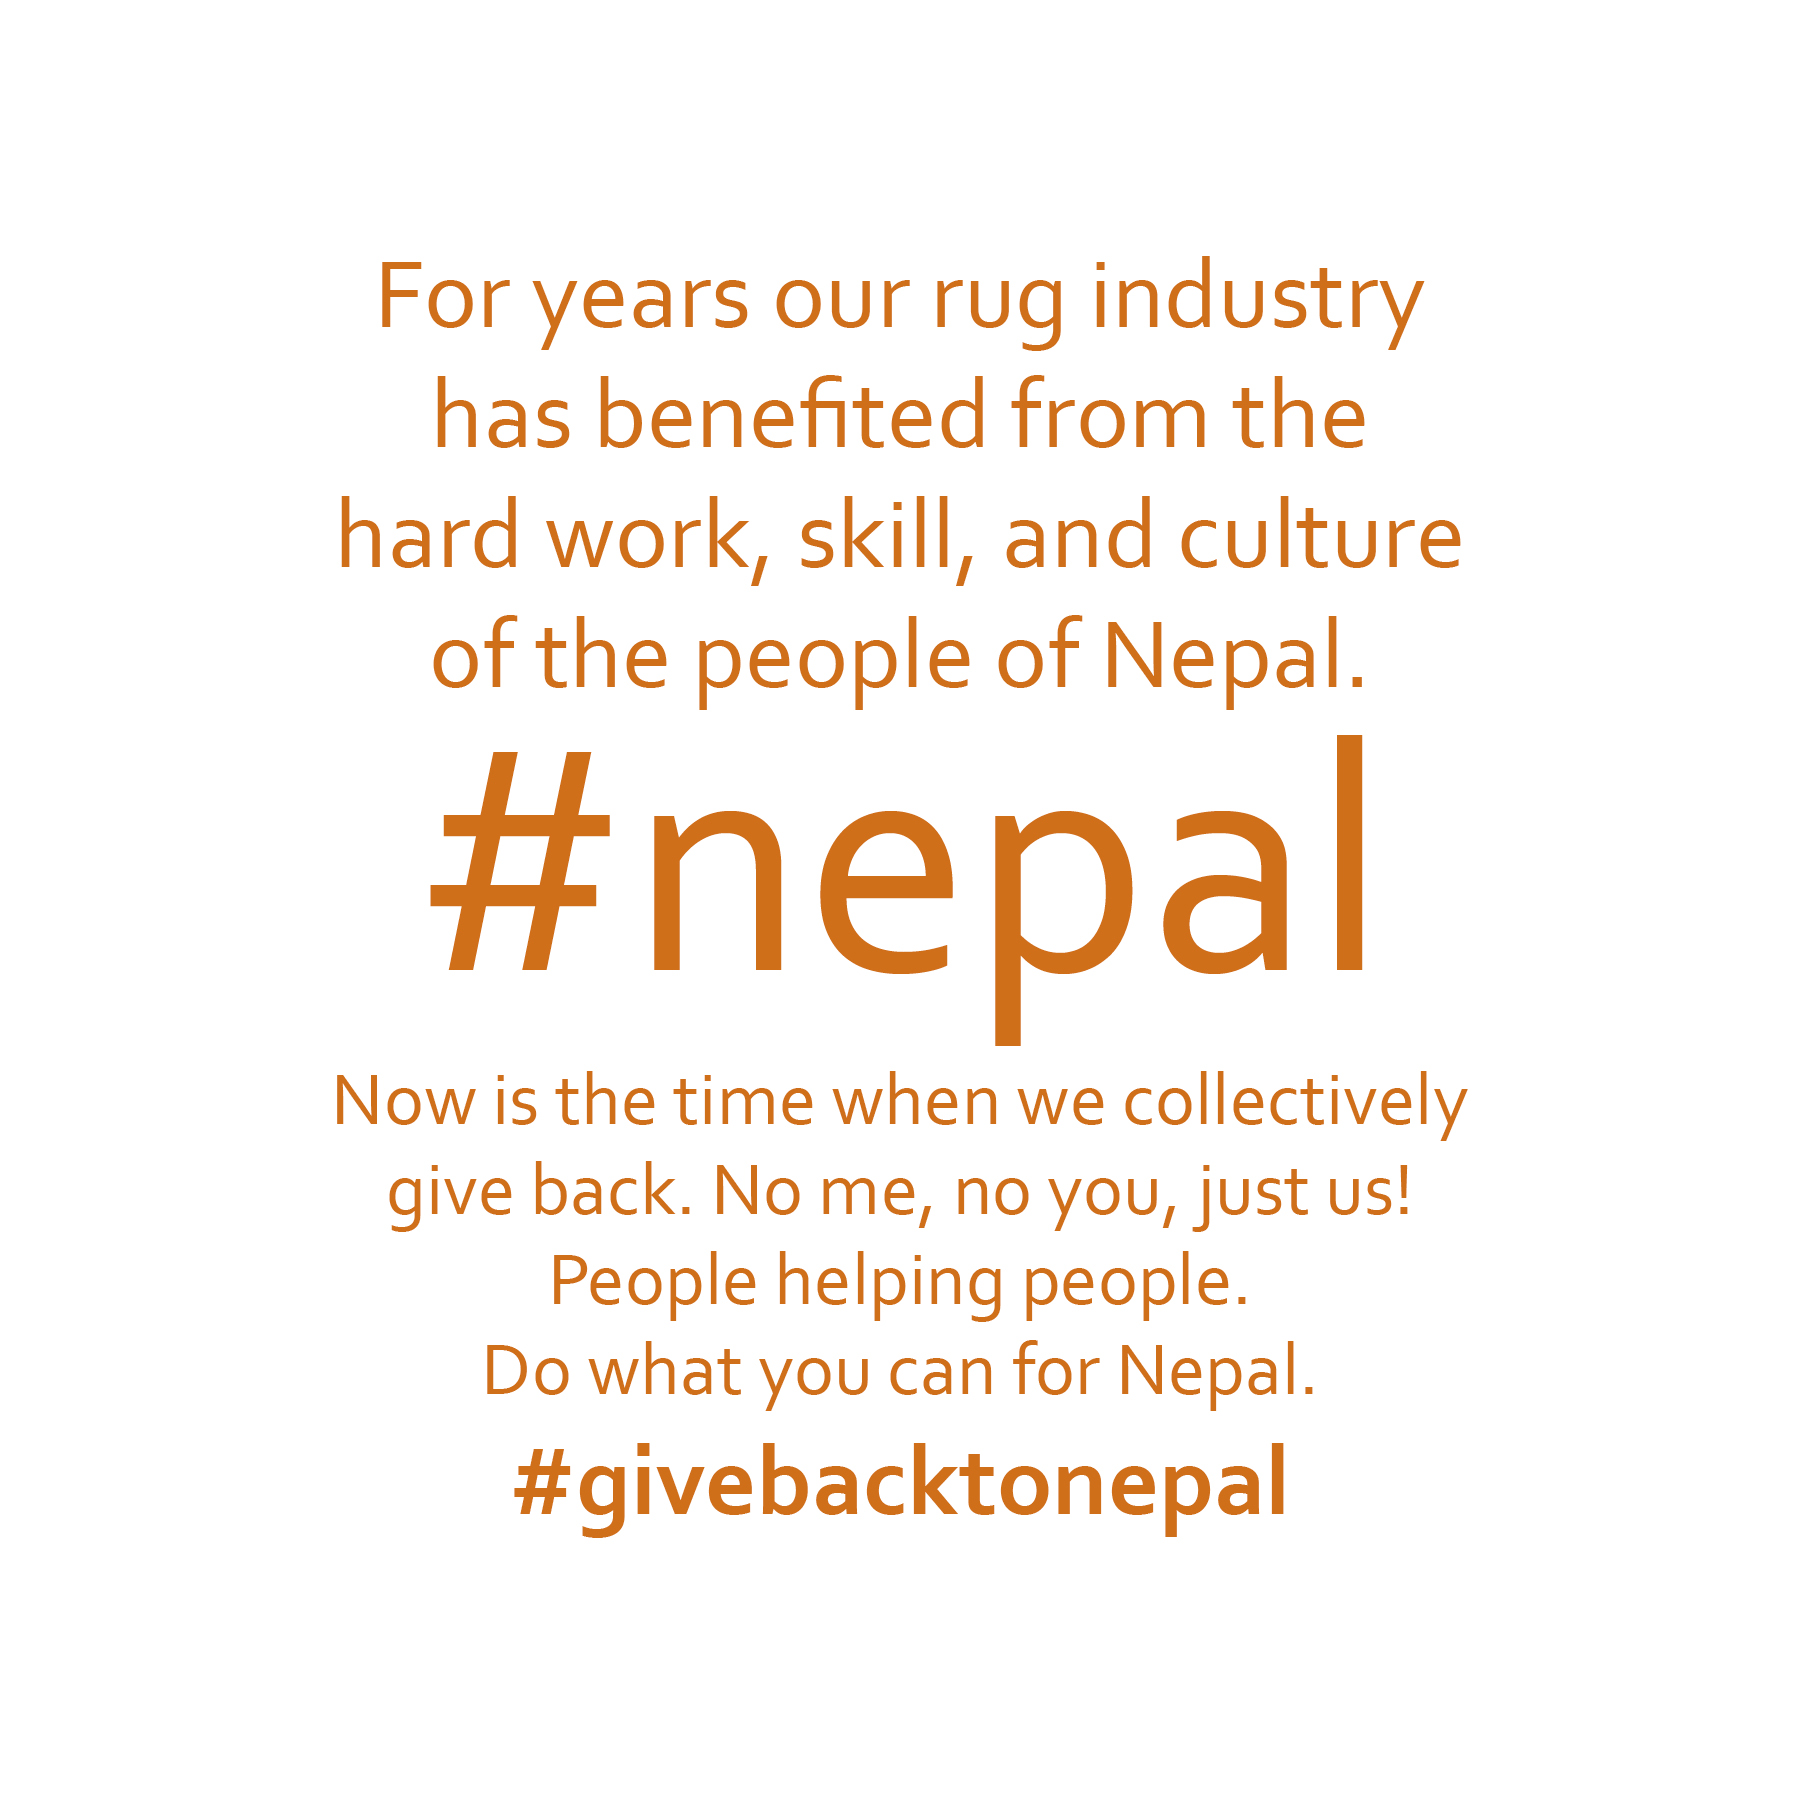 Give Back to Nepal - #givebacktonepal - The Ruggist